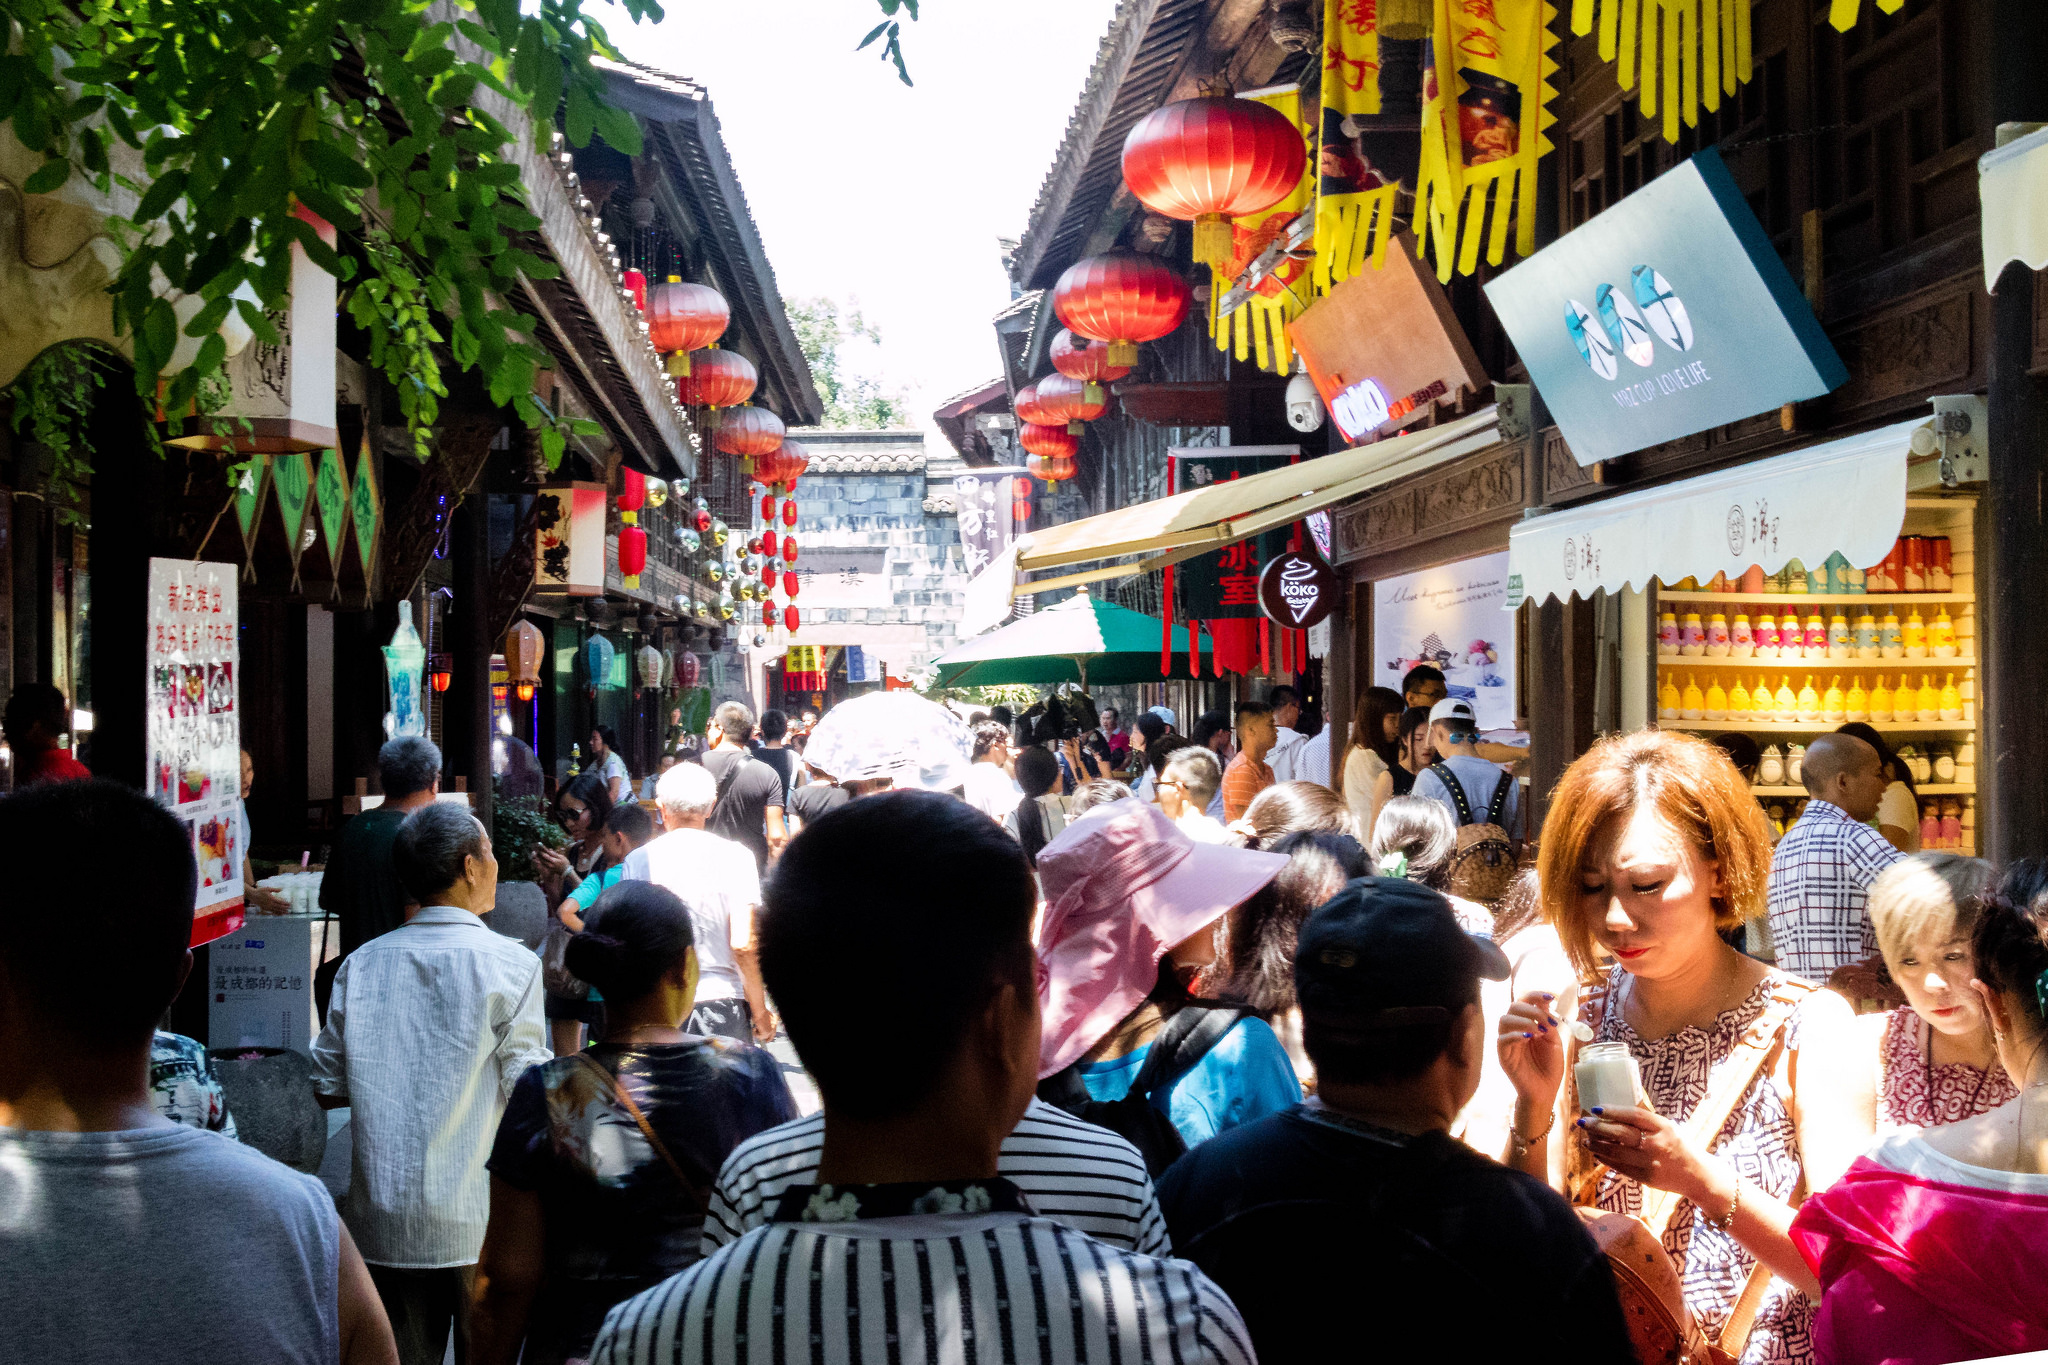 Jinli Street by sheiladeeisme, on Flickr